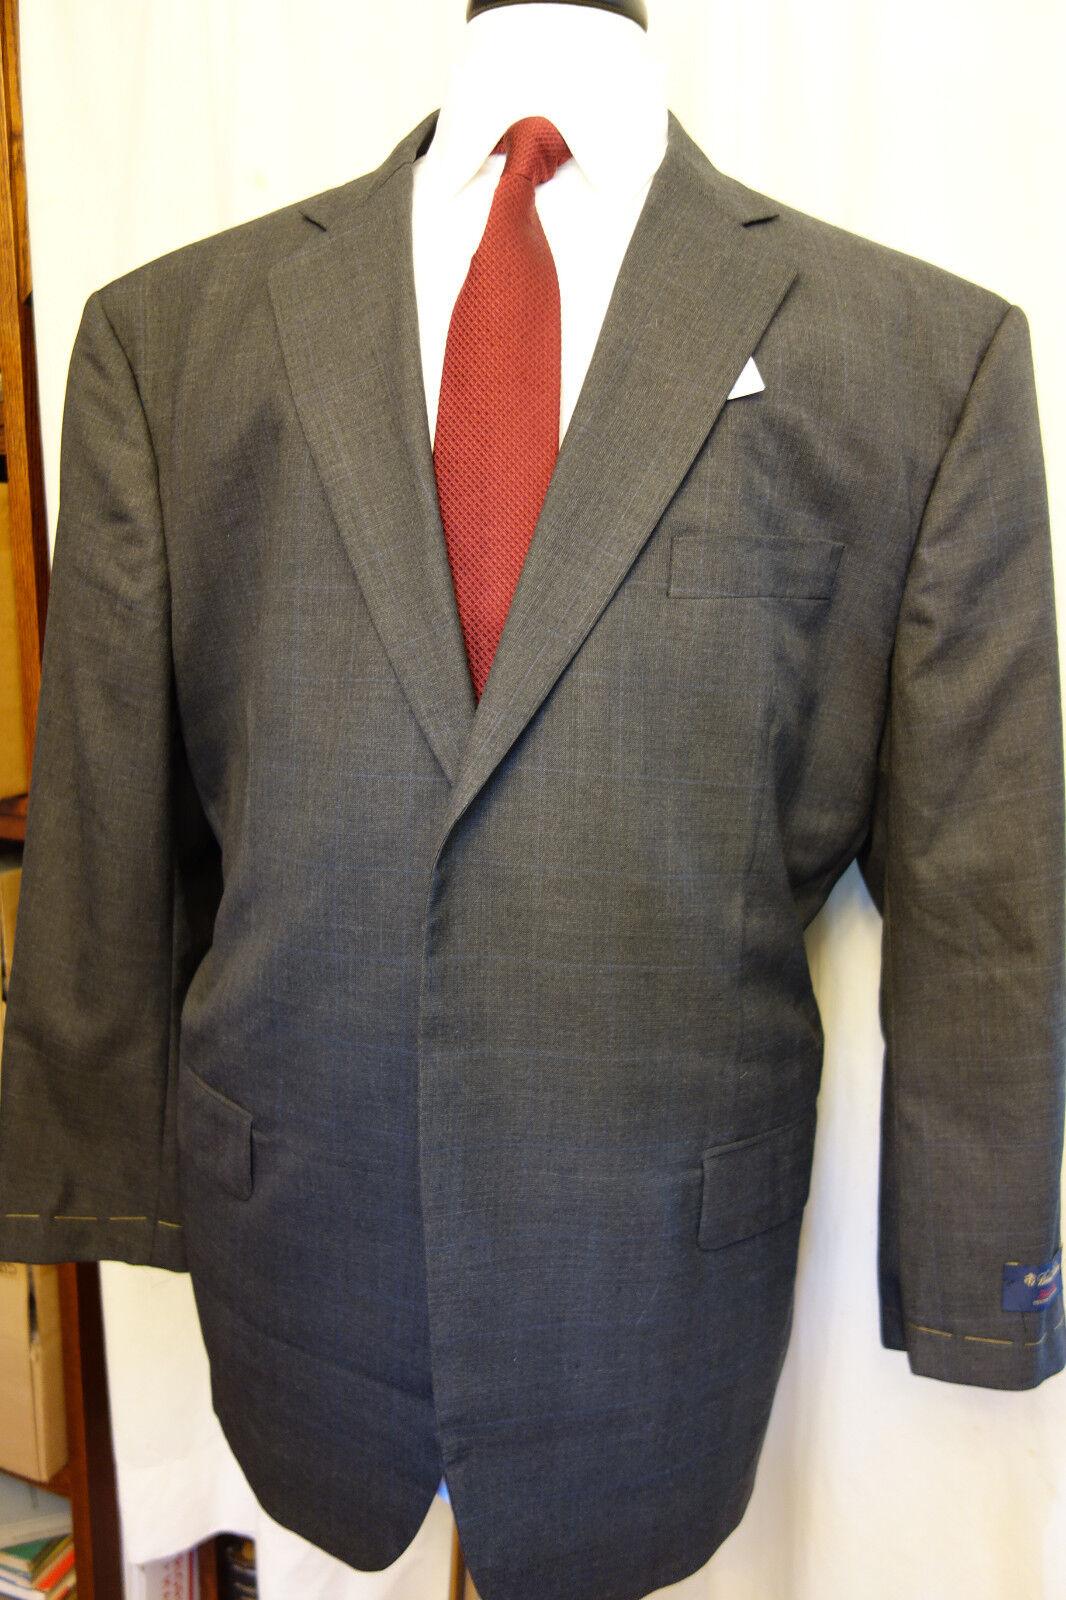 NWT Brooks Brothers Golden Fleece Dk grau Glen Plaid Wool Suit 48R  MSRP 2400